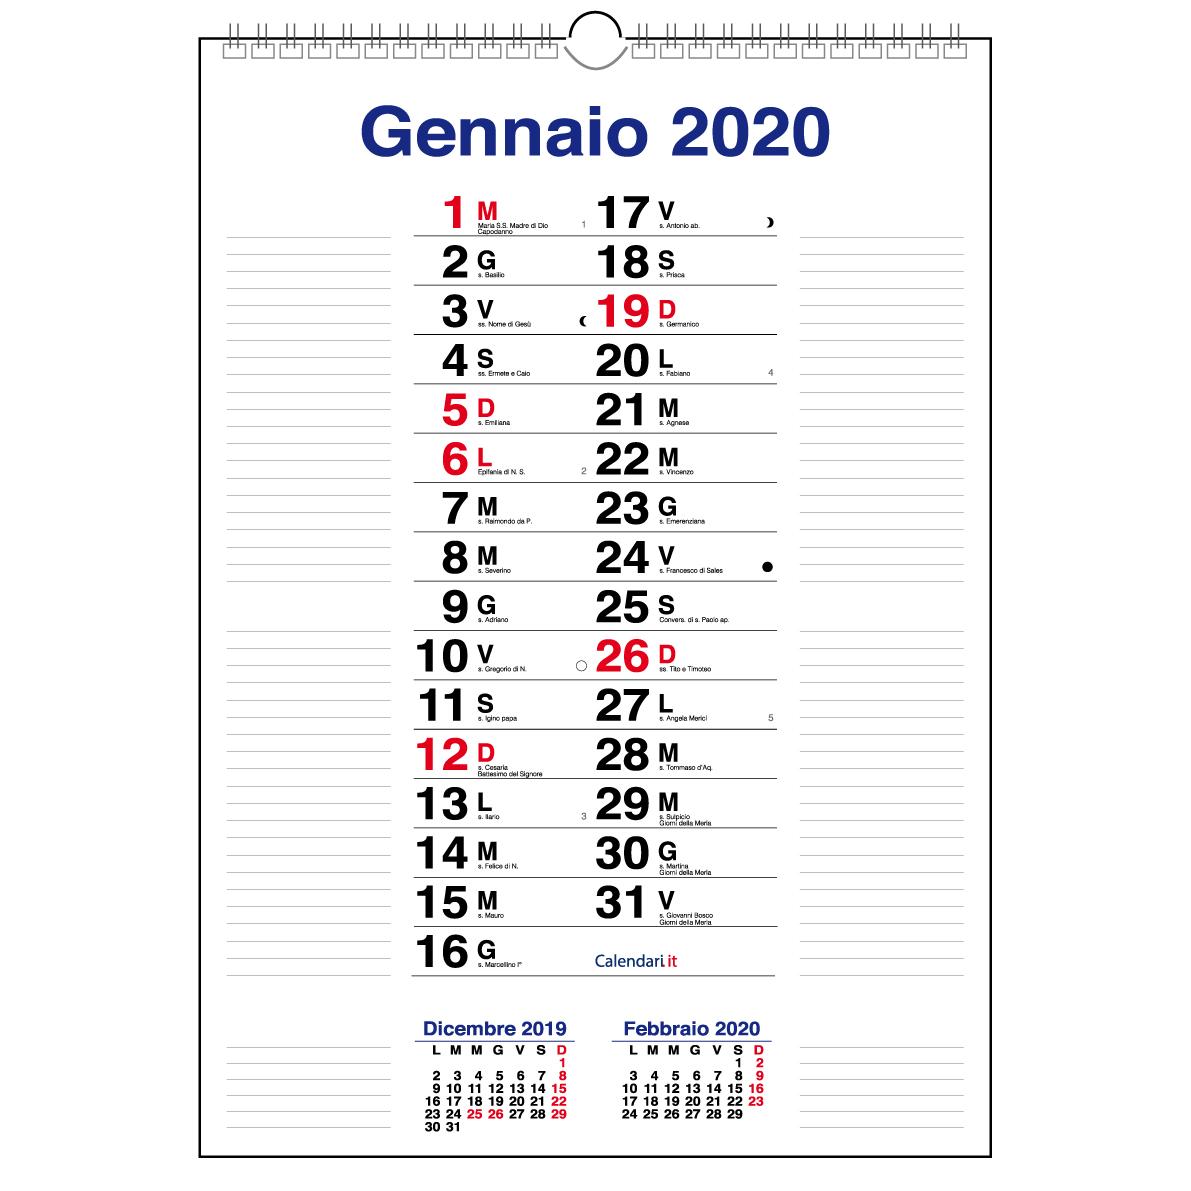 Vangelo Del Giorno Calendario Romano.Calendario 2020 Olandese